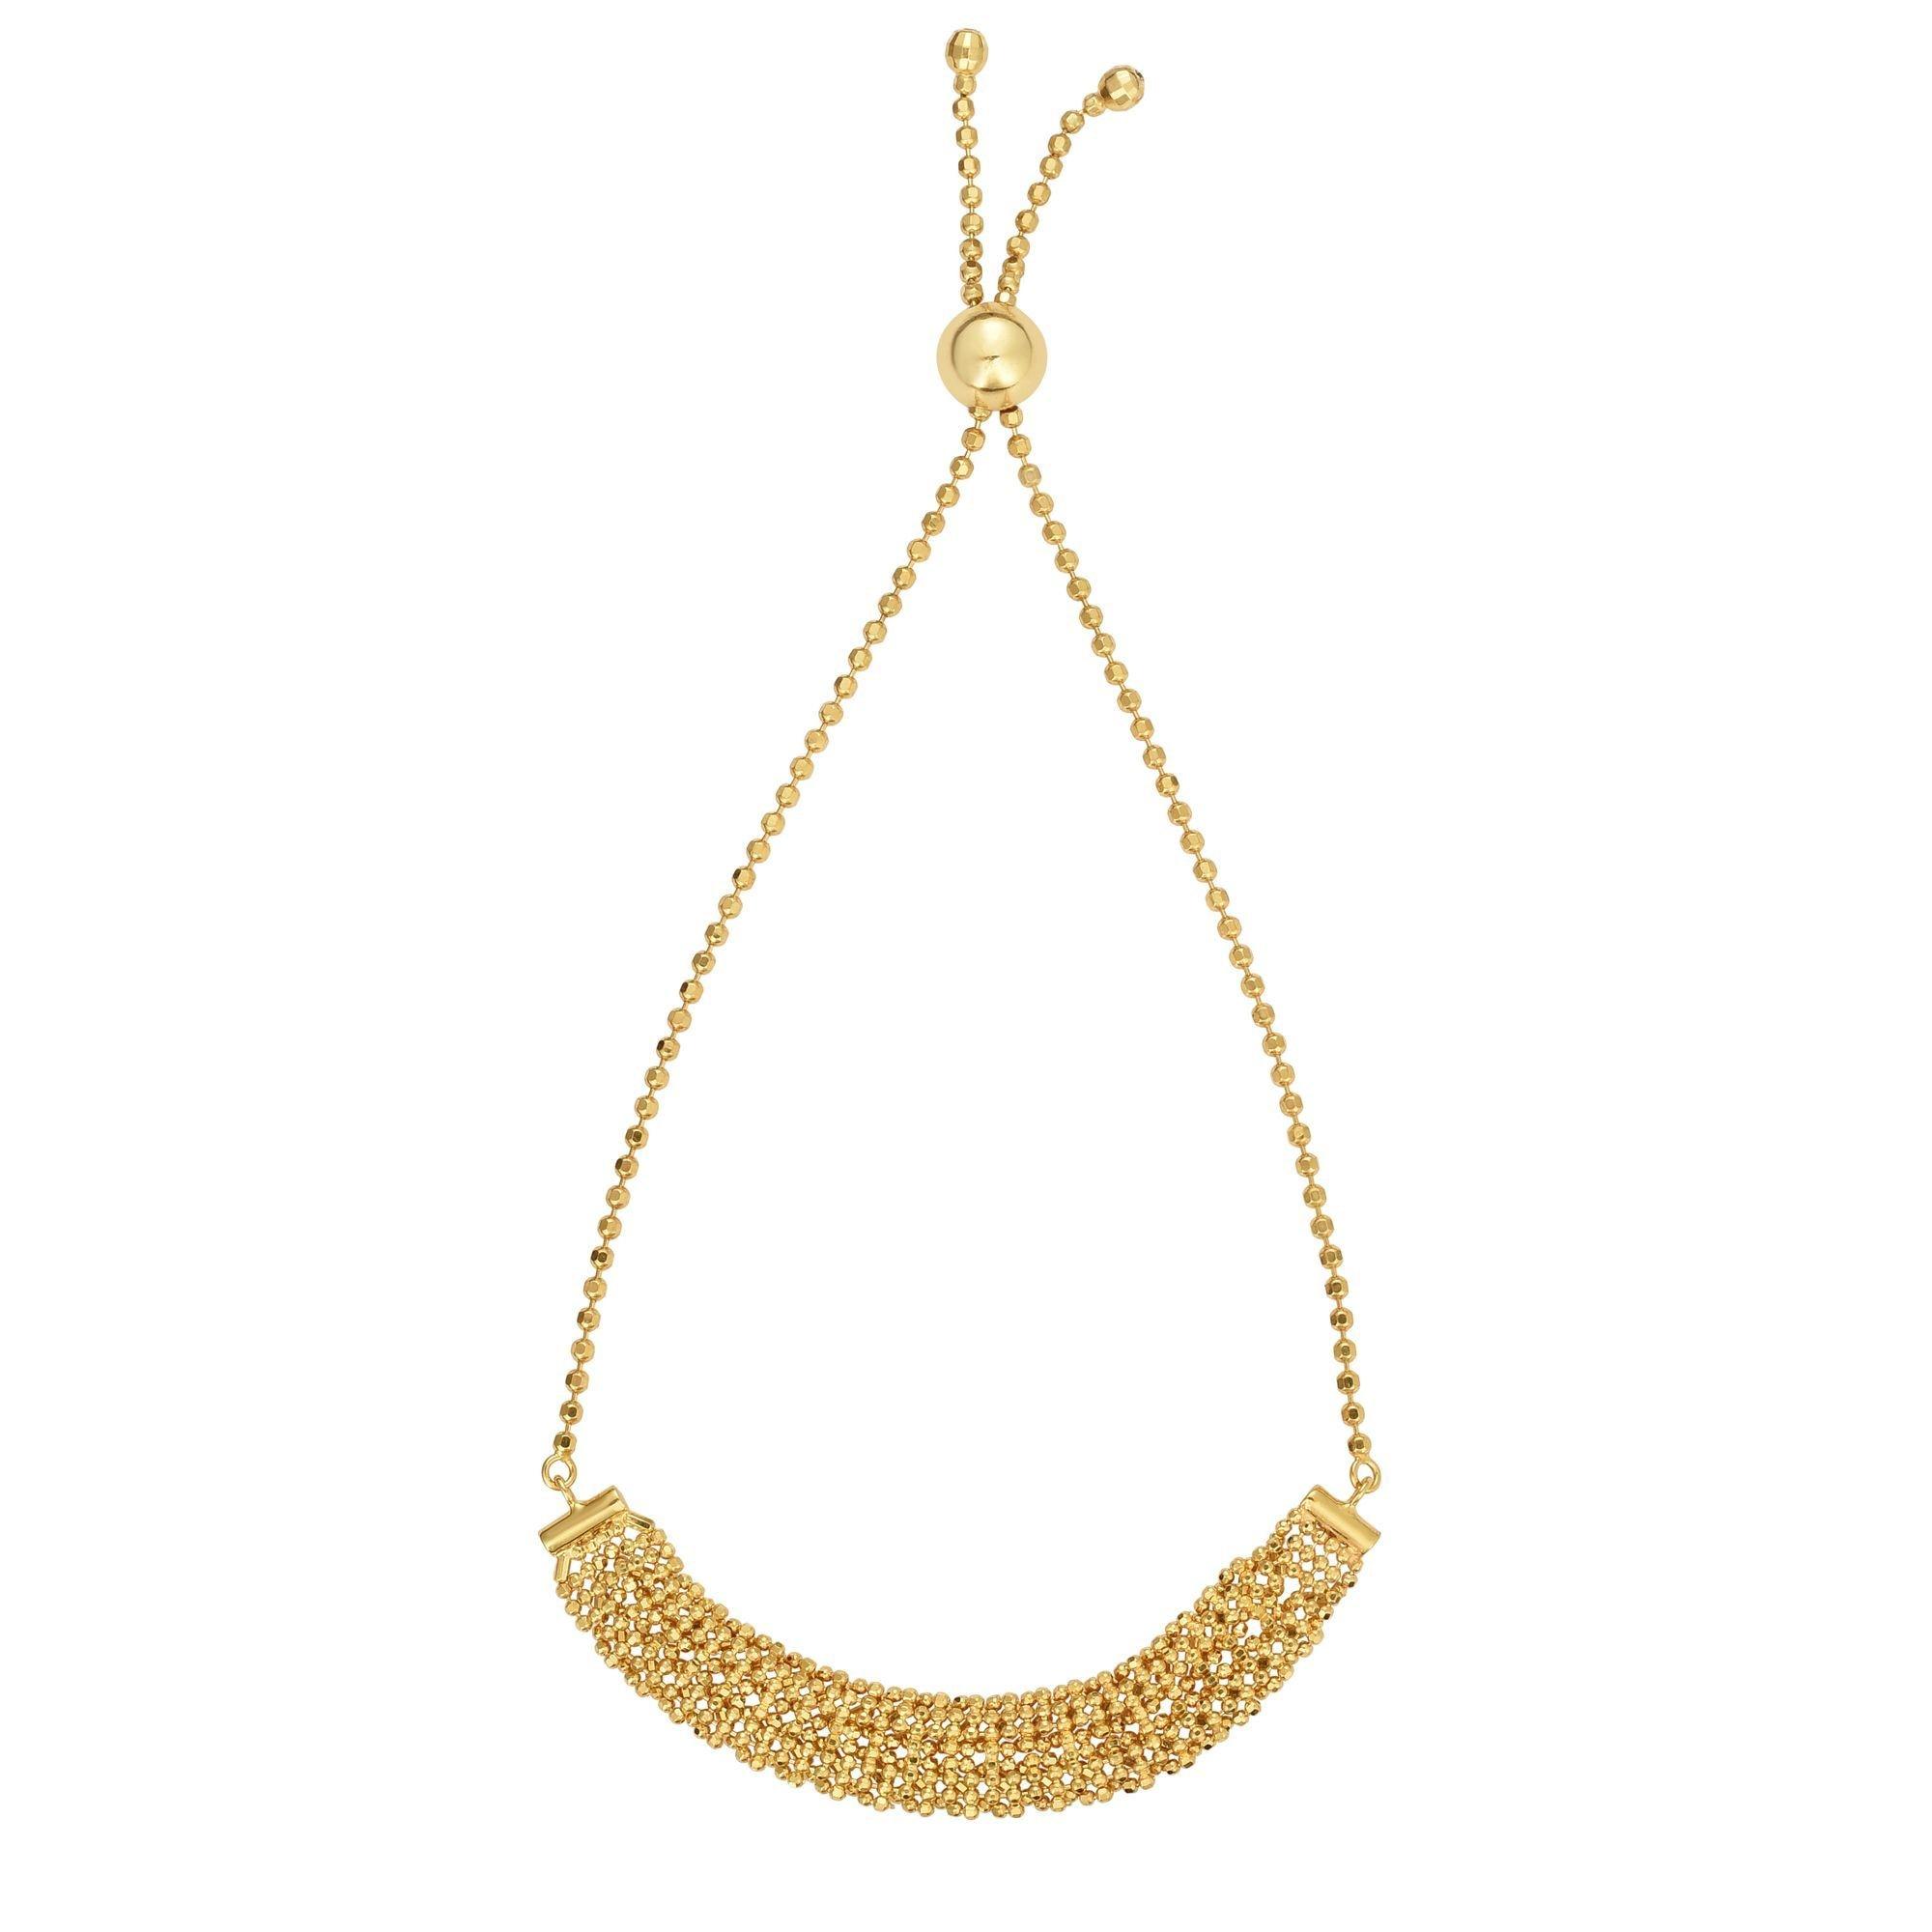 BH 5STAR 14kt Gold 9.25'' Yellow Finish Shiny+Diamond Cut Adjustable Bracelet with Draw String Clasp